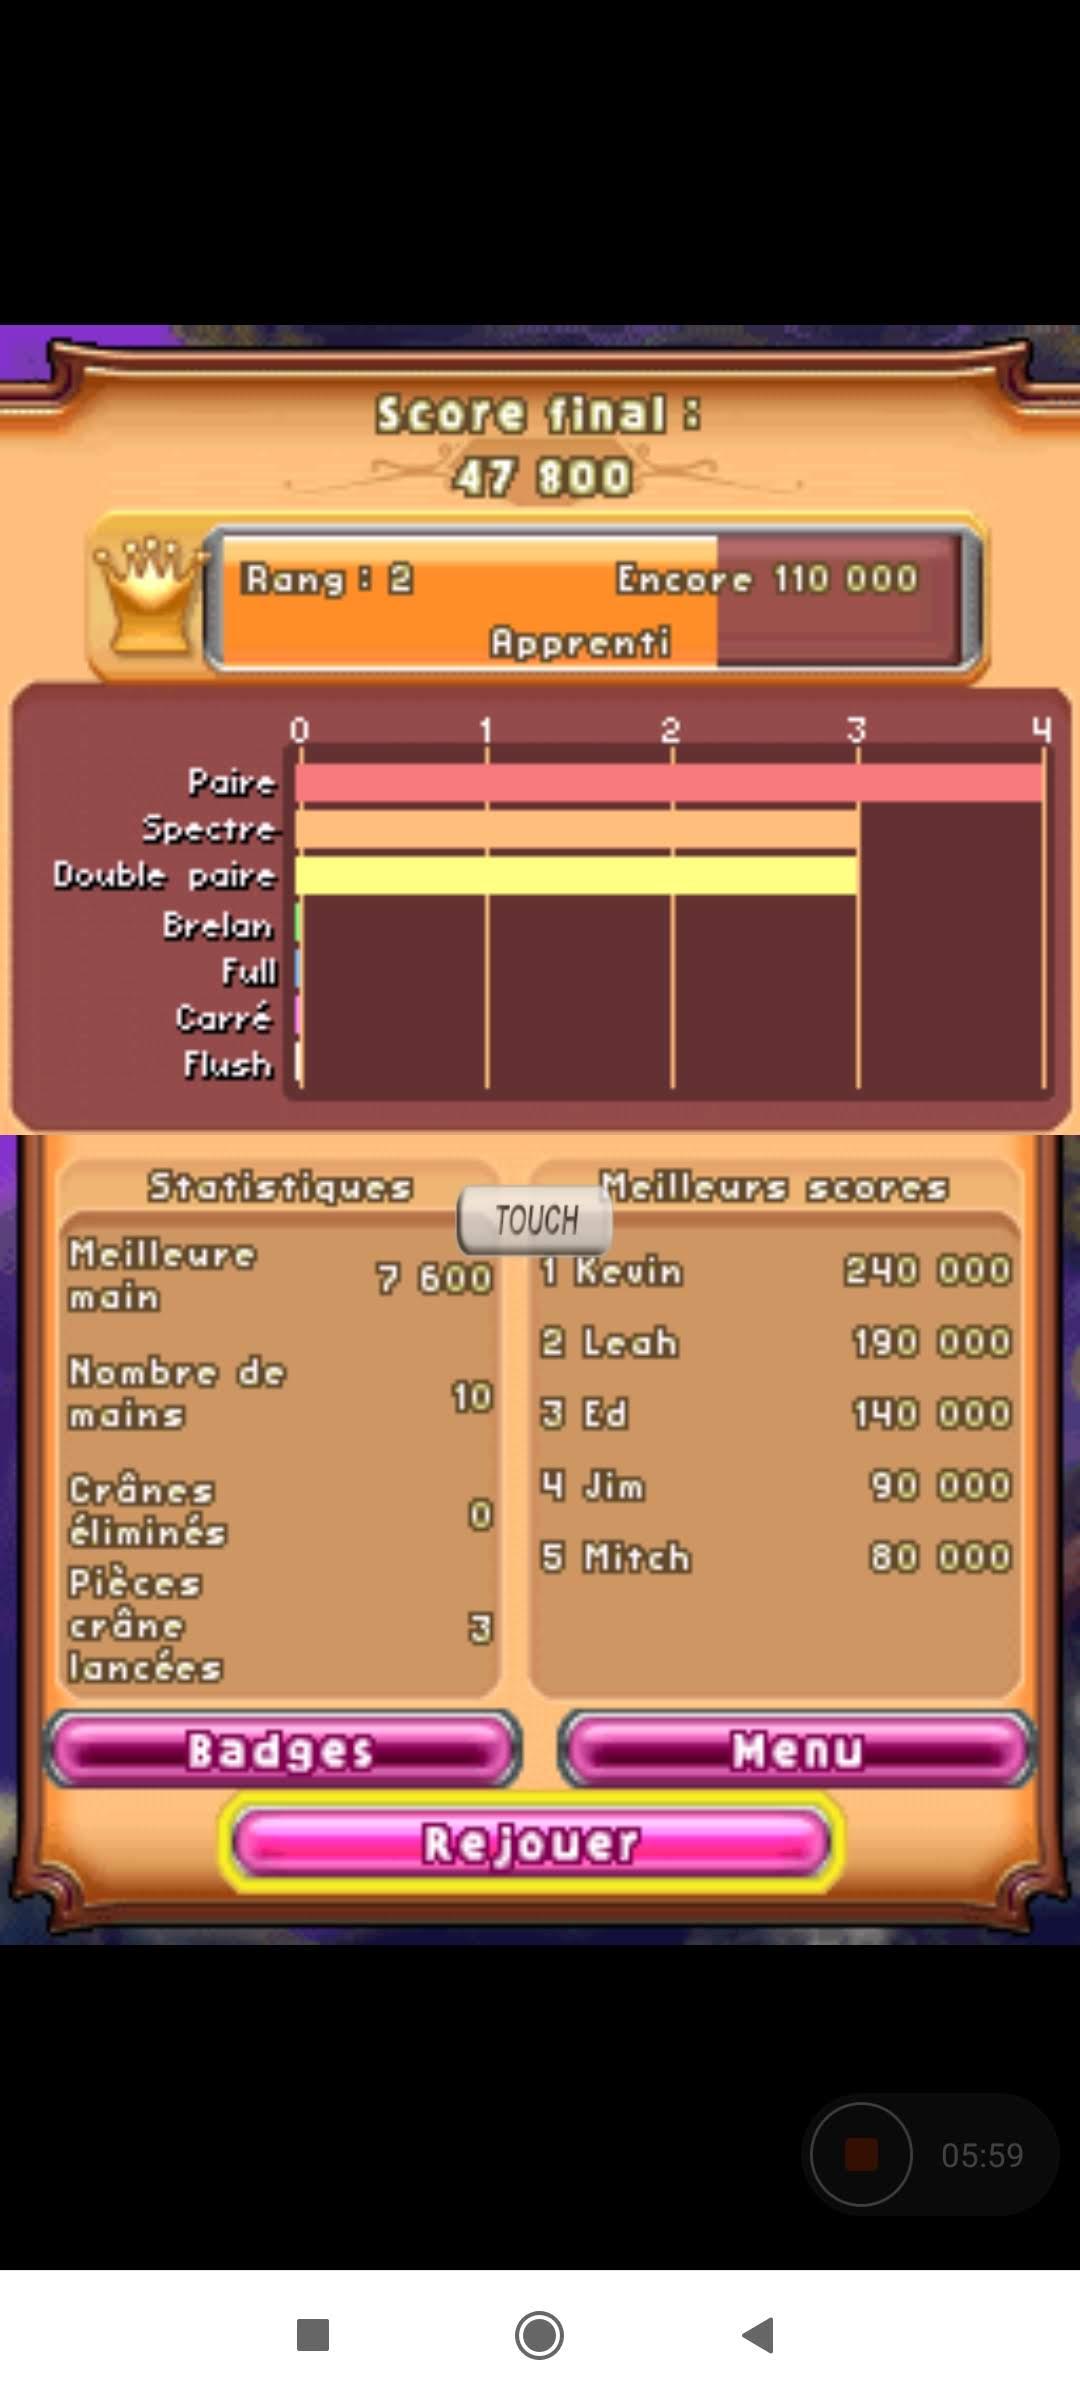 Larquey: Bejeweled 3: Poker [Number of Flush] (Nintendo DS Emulated) 0 points on 2020-09-26 03:35:09